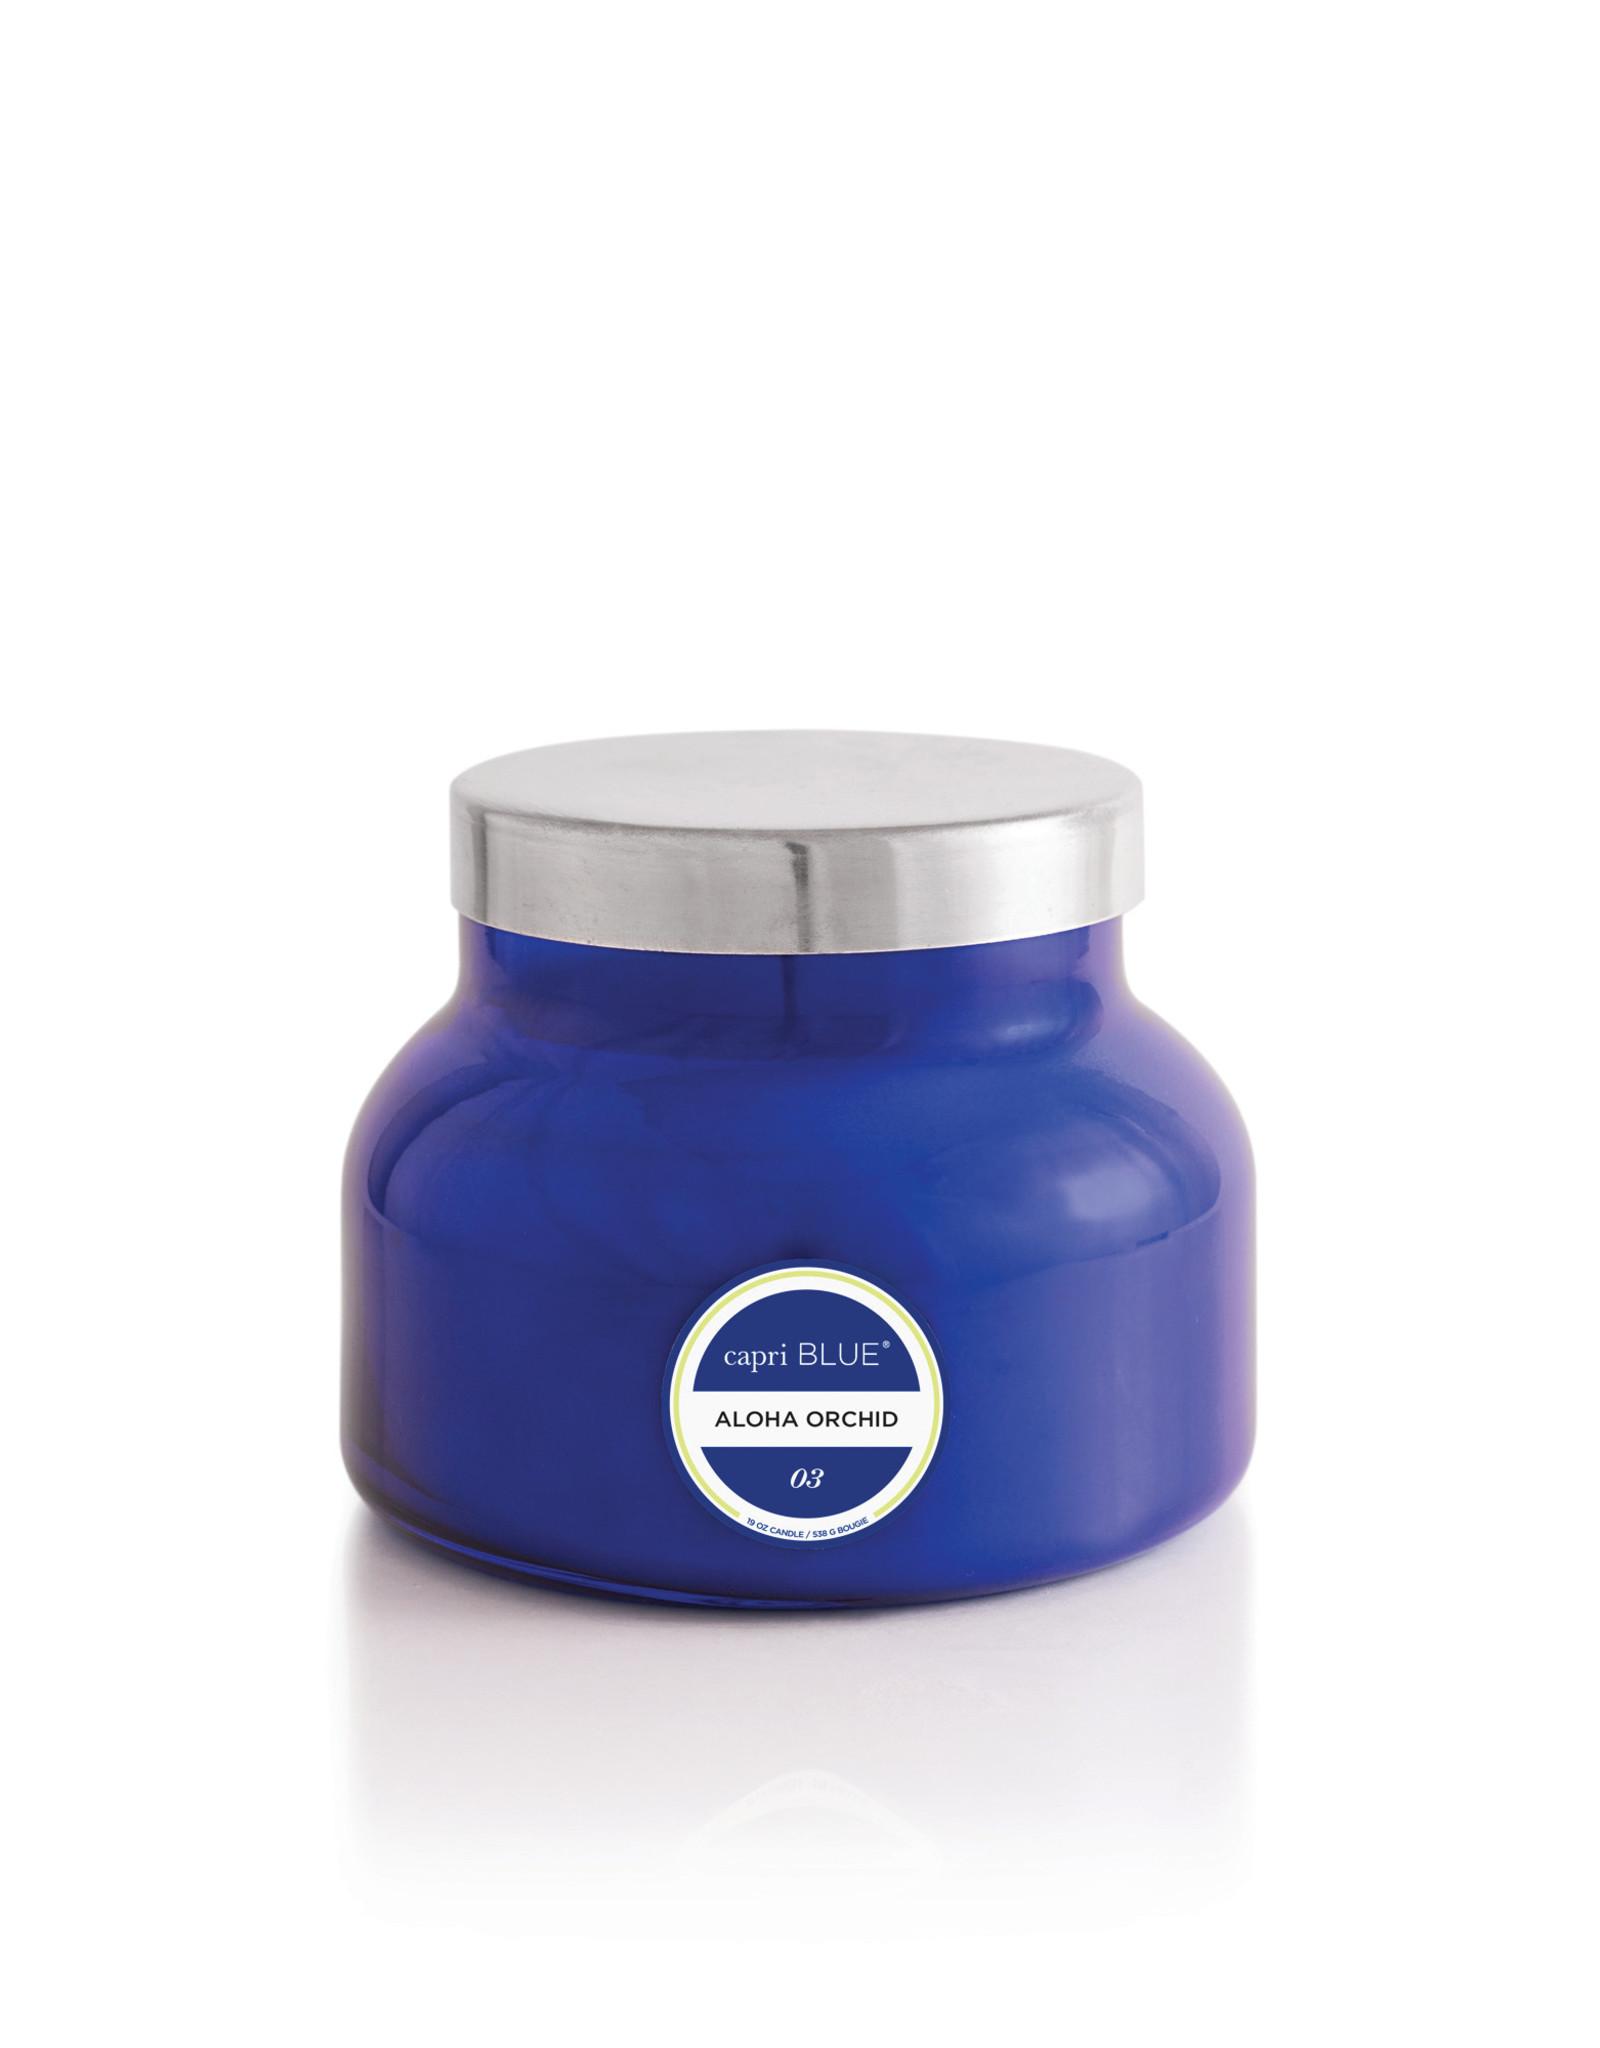 capri BLUE® Signature Jar Candle